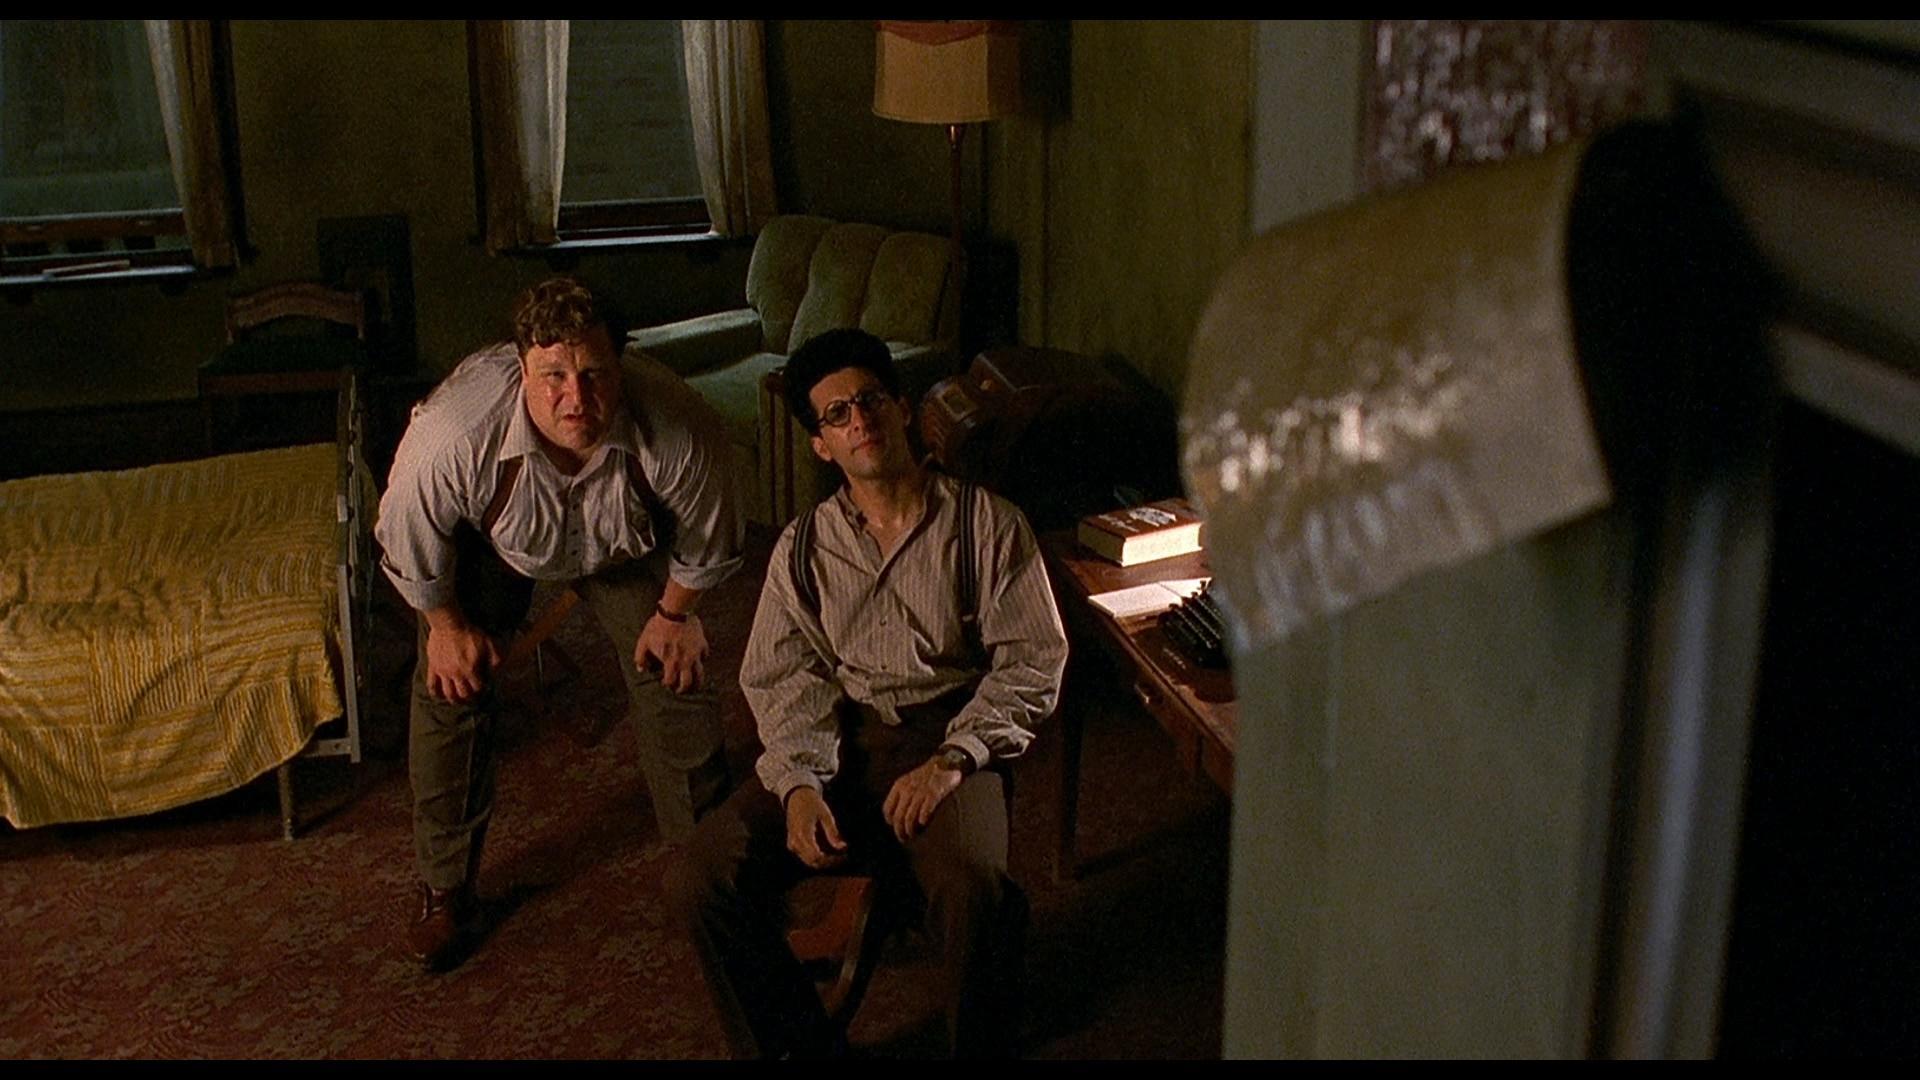 John Goodman & John Turturro